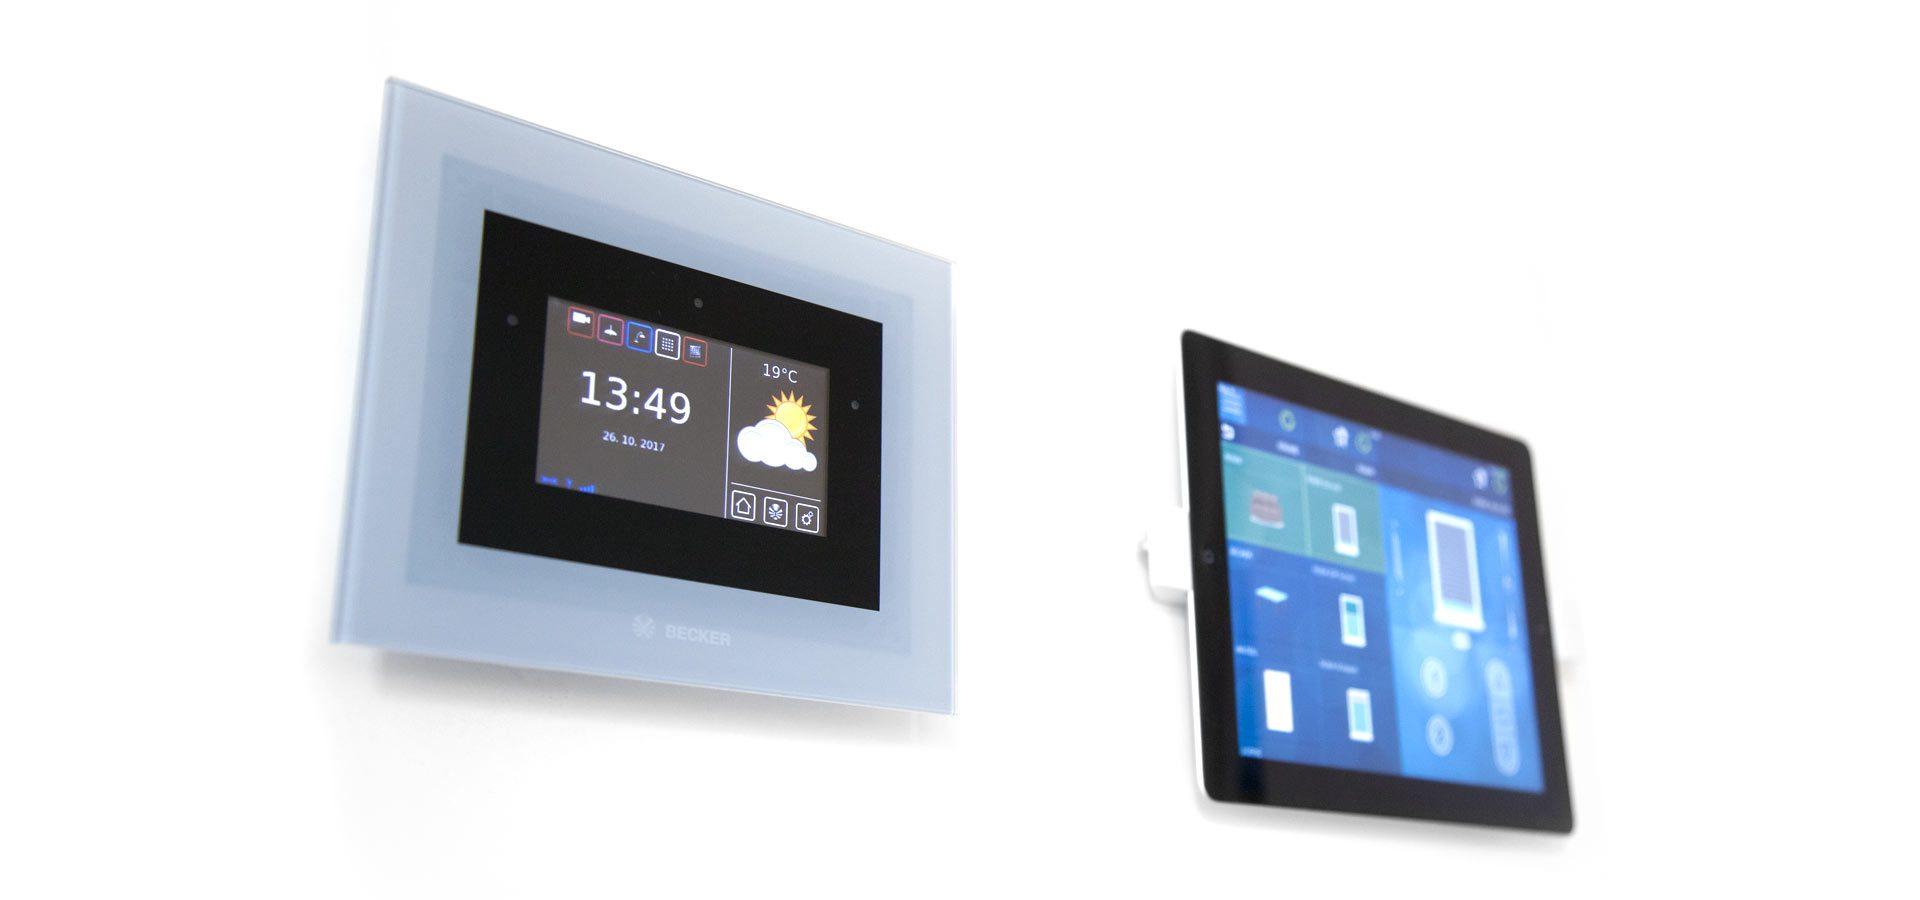 mechatronik automatisierung smart home schwarz gmbh. Black Bedroom Furniture Sets. Home Design Ideas